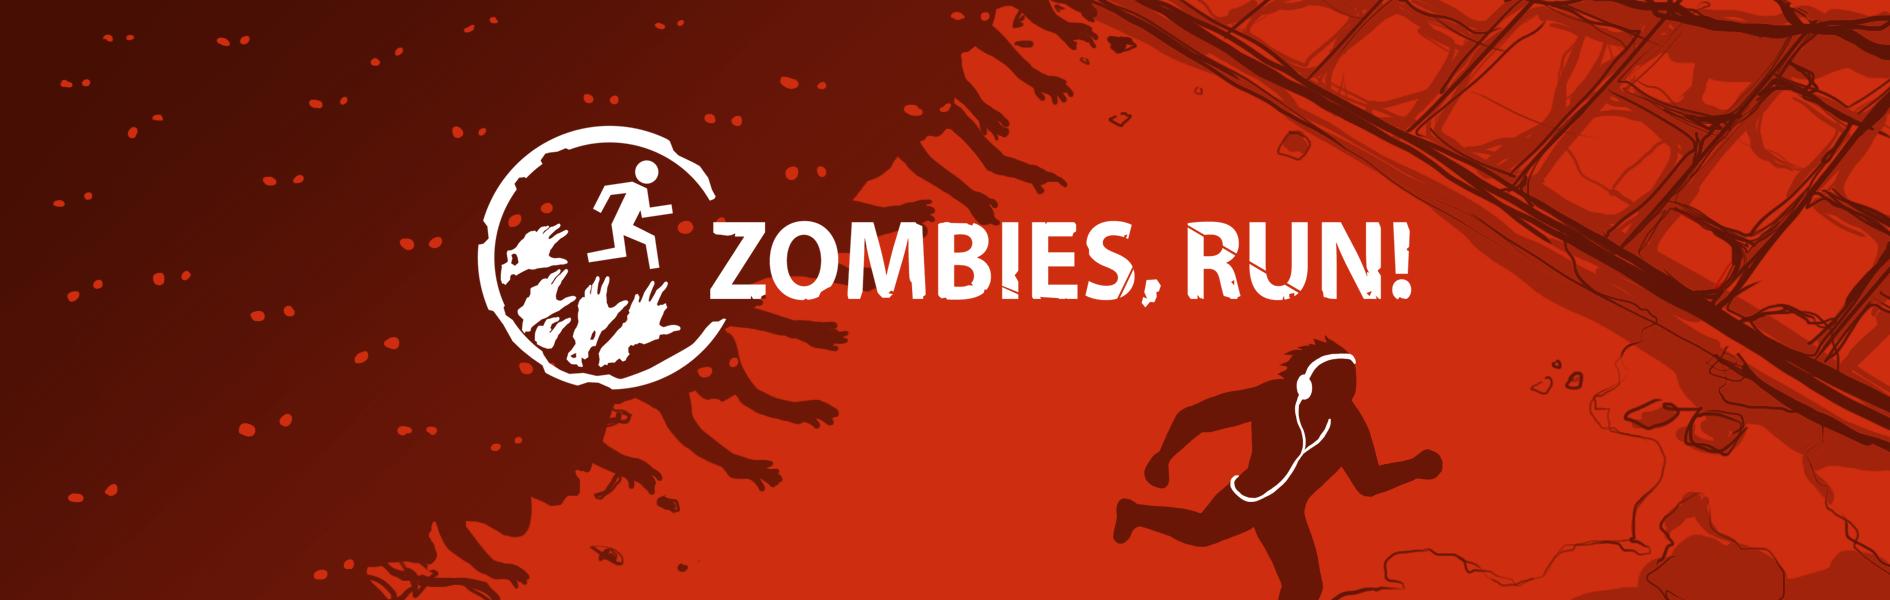 Zombies, Run! App